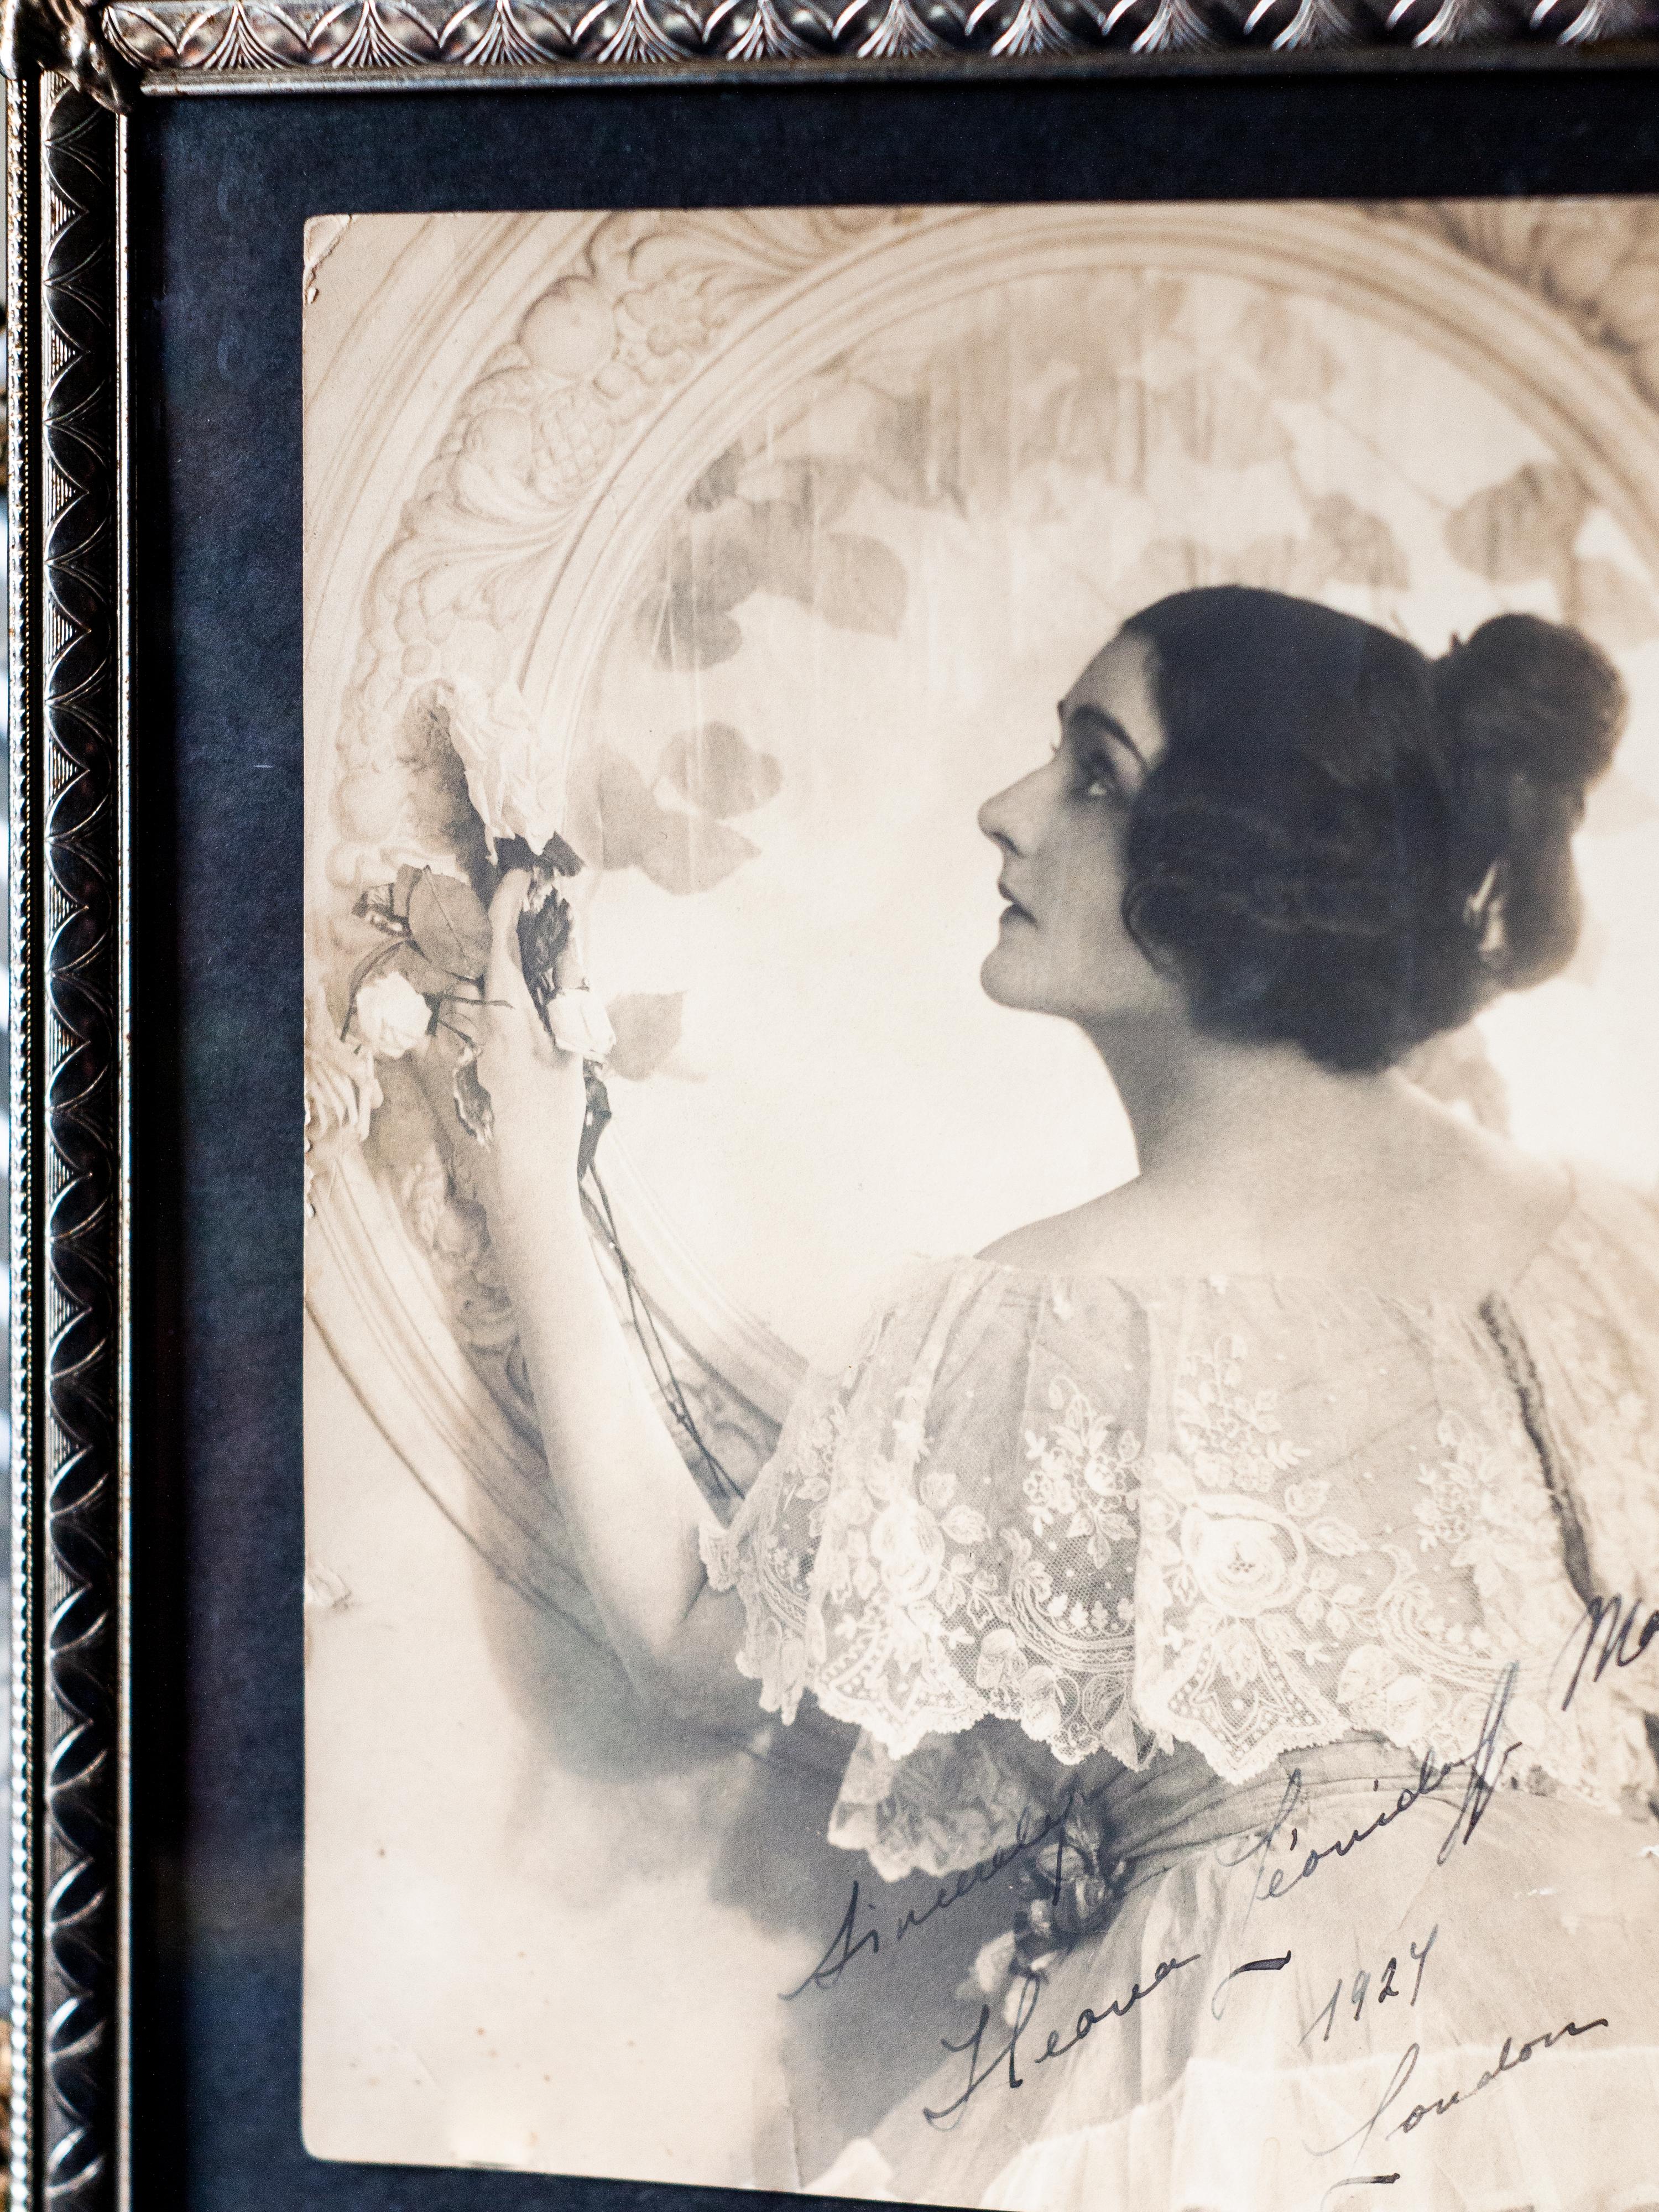 Ileana Leonidoff 1924 Autographed Photo